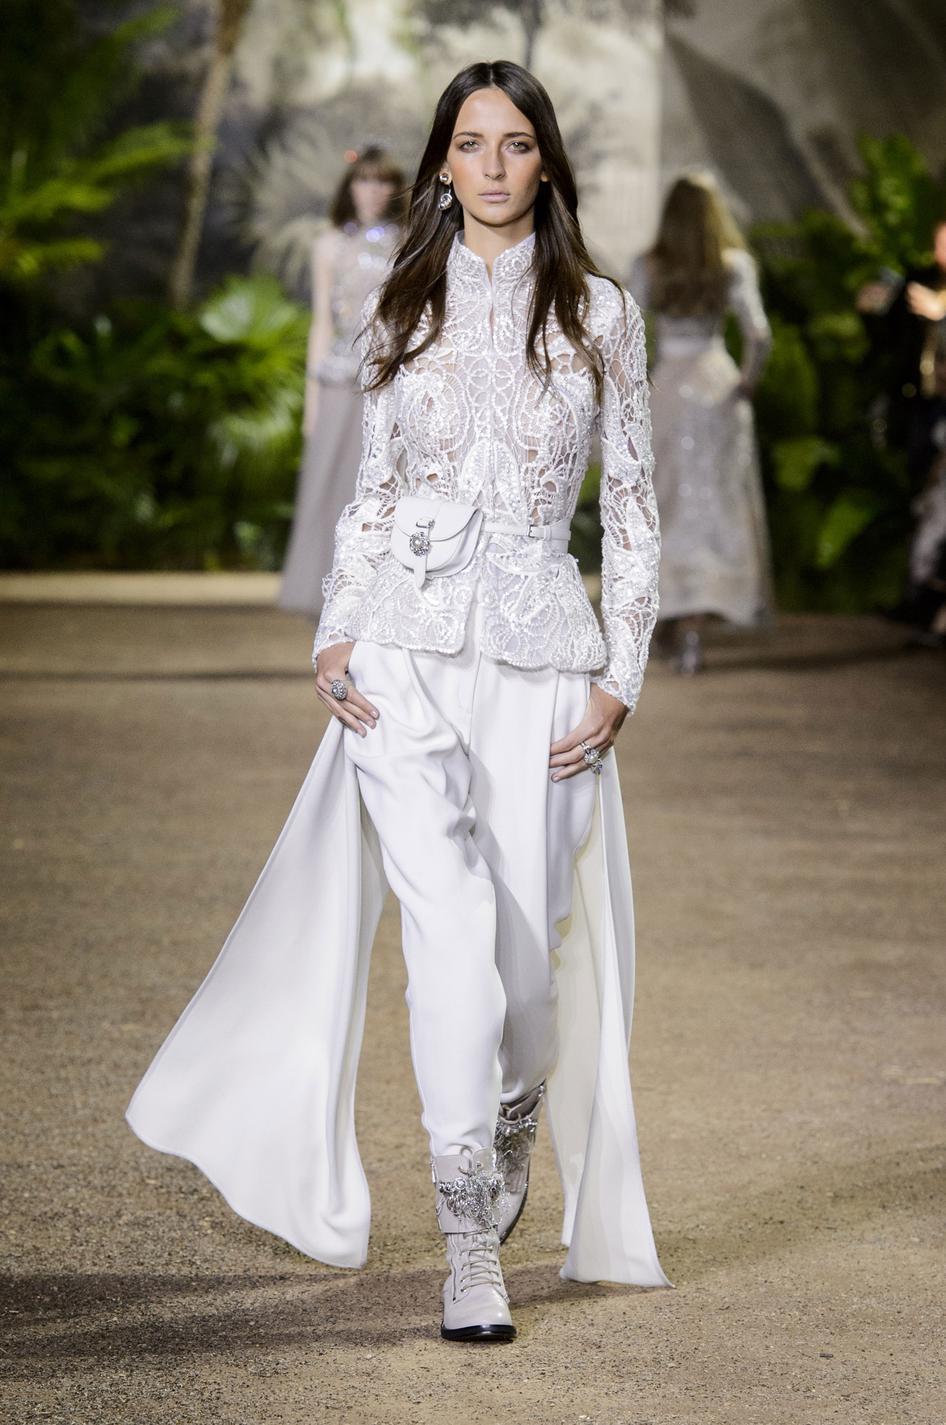 Mariage Exit La Robe De Mariee Oui Au Pantalon Madame Figaro